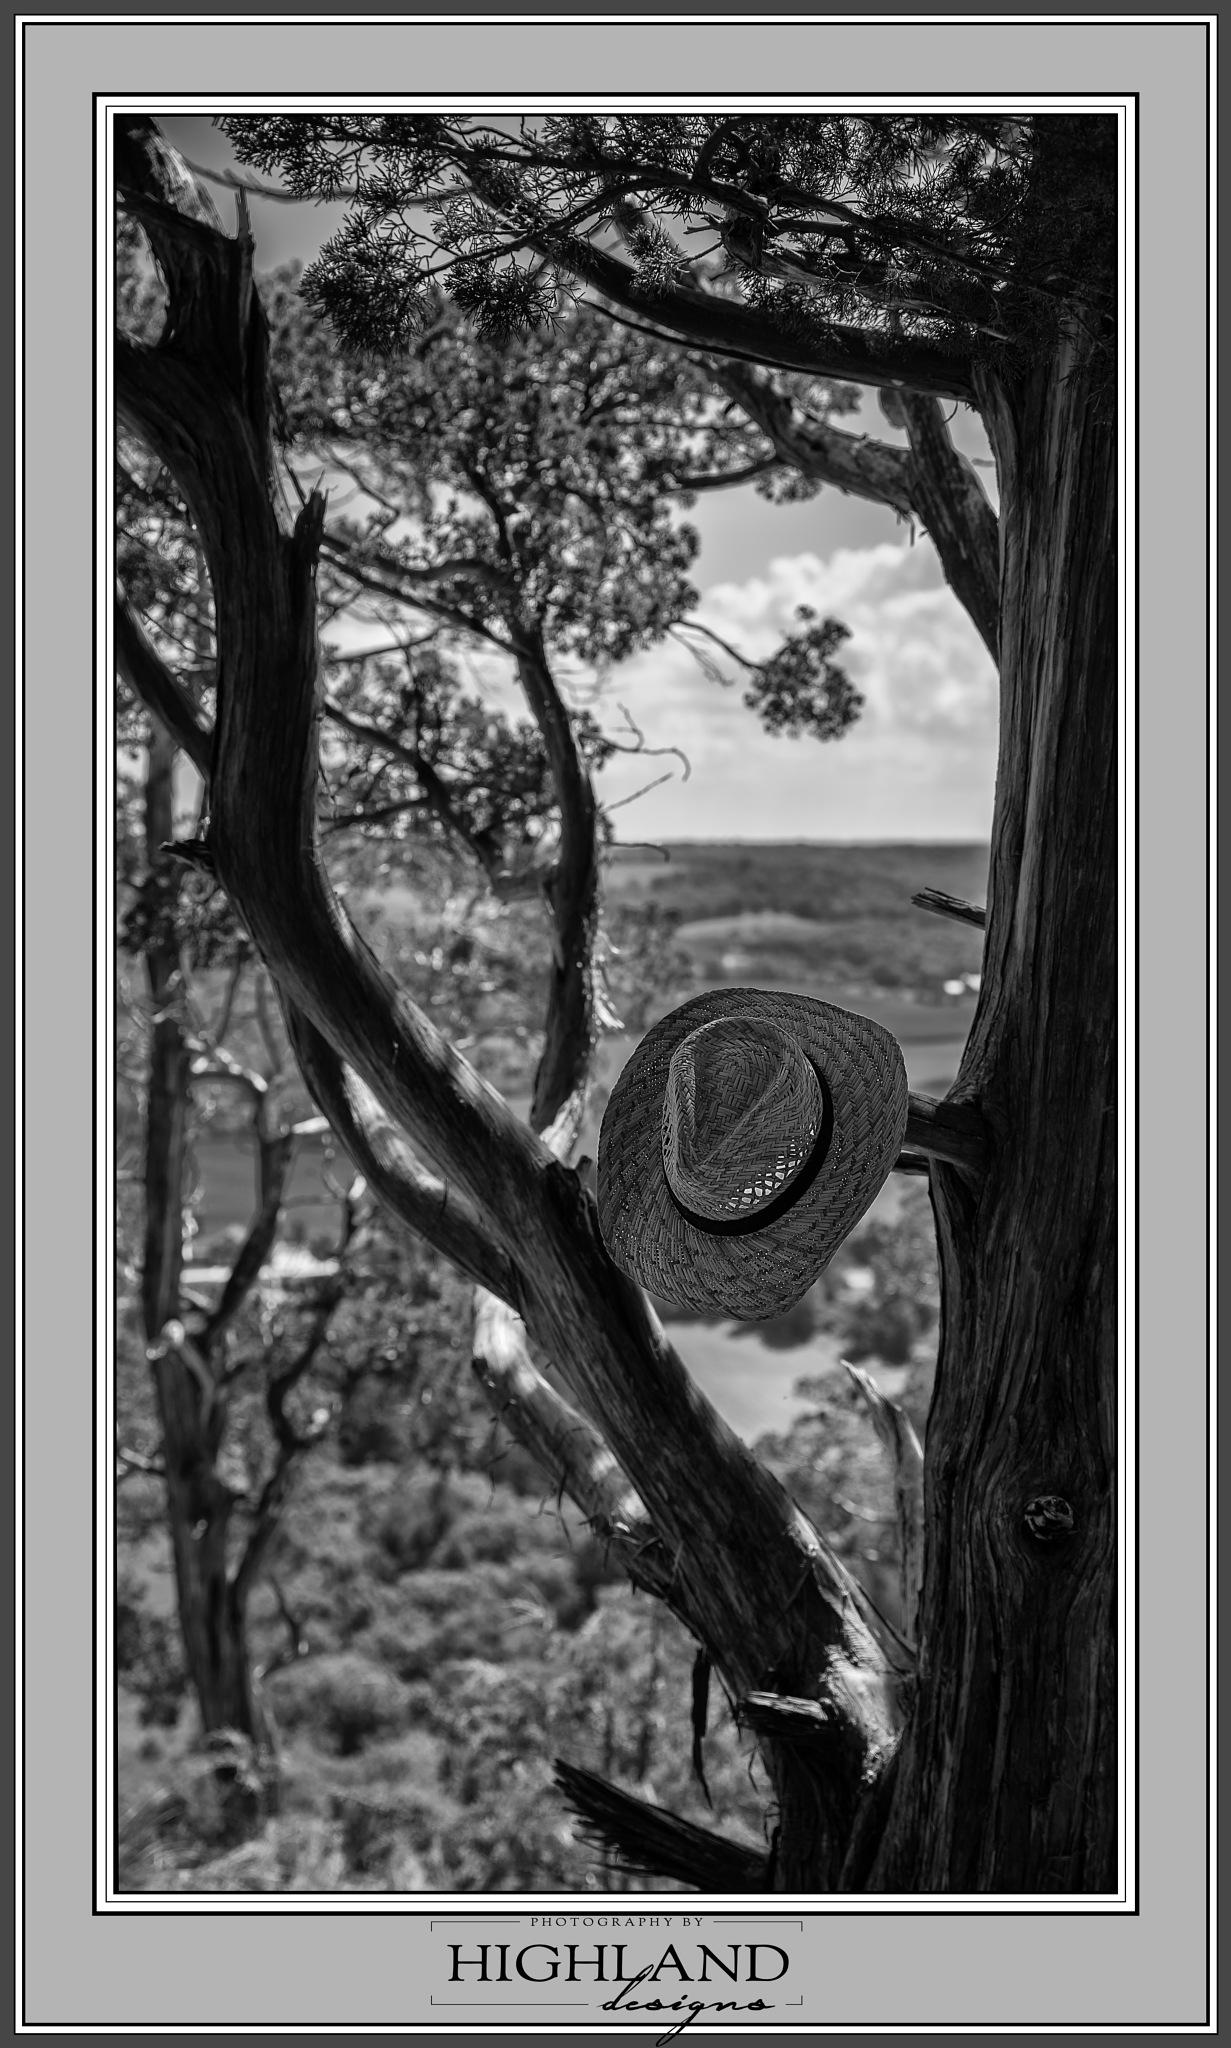 Cowboy Hat B&W by Photography By Highland Designs